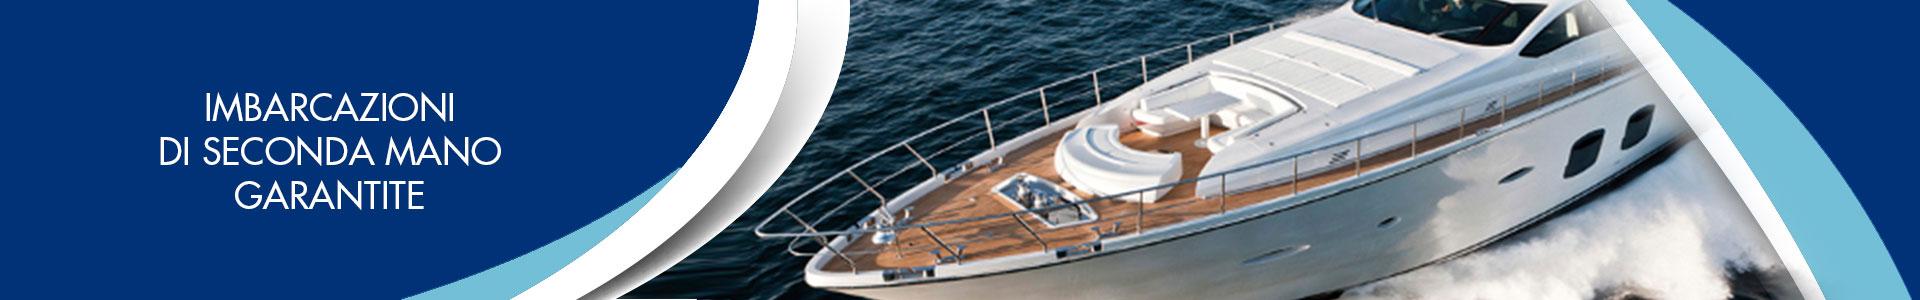 servizi-imbarcazioni-usate